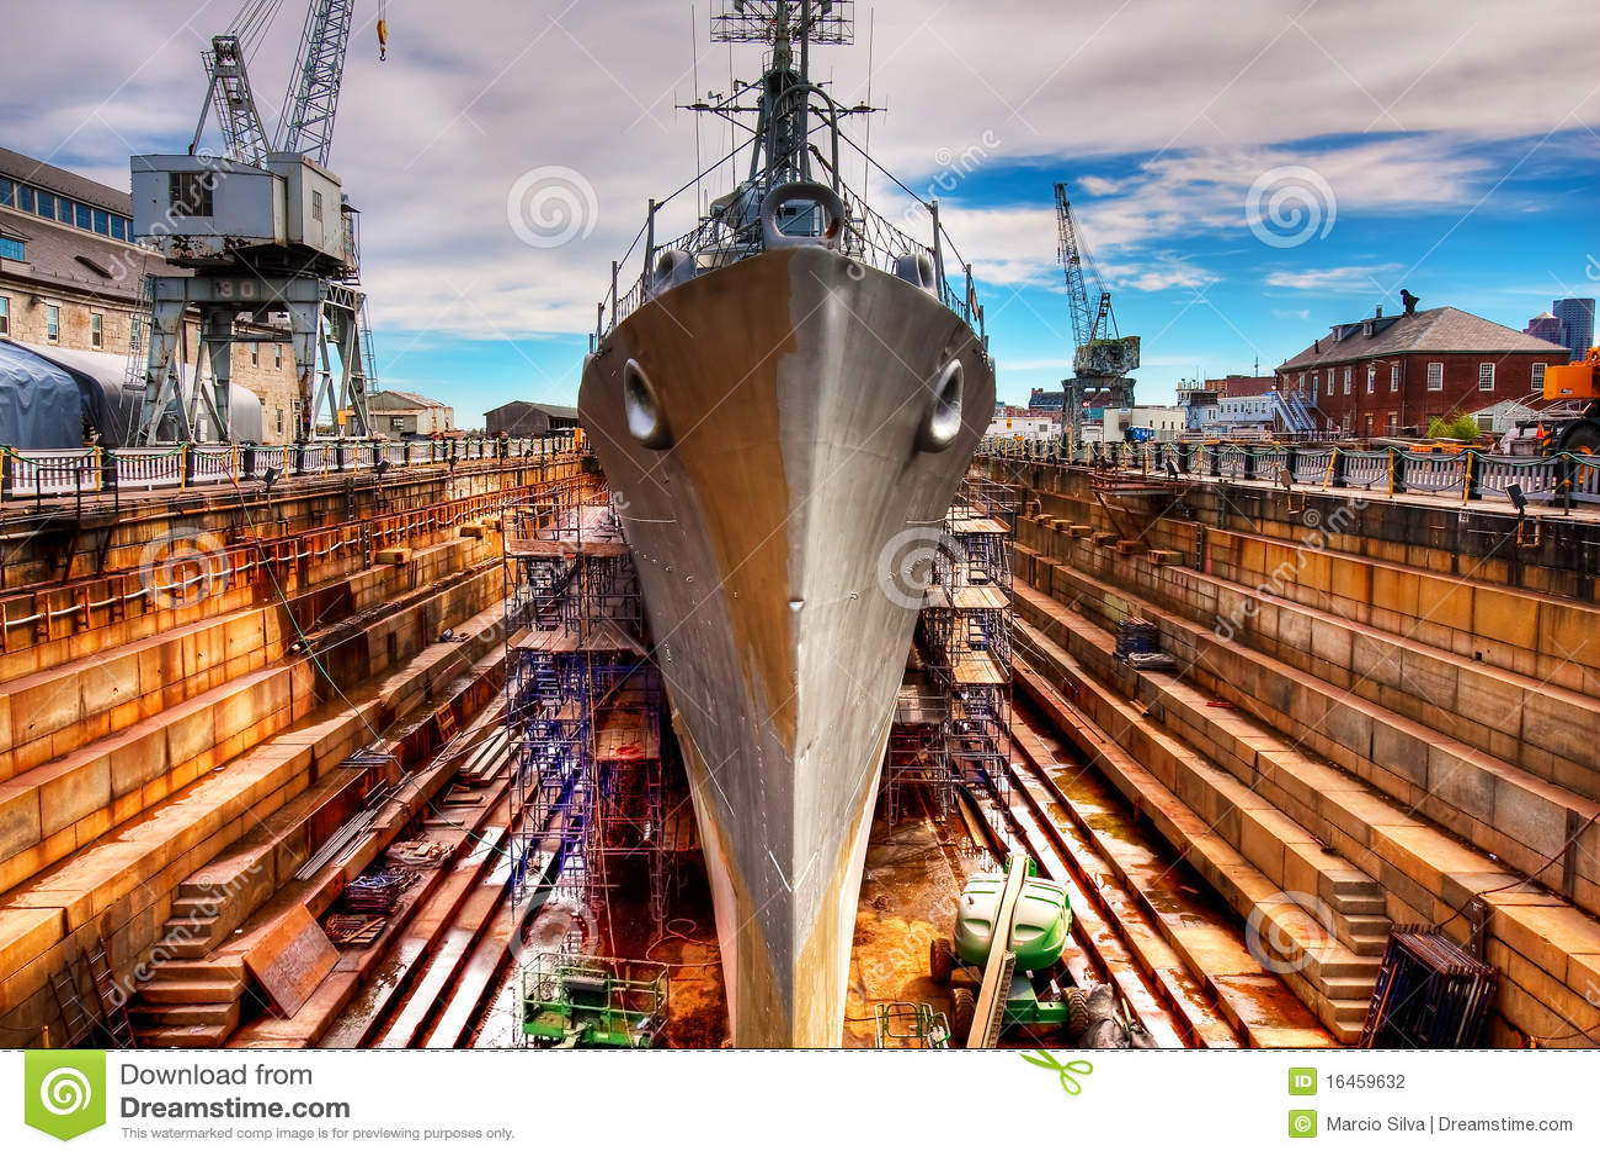 ShipyardRFP Drydocks